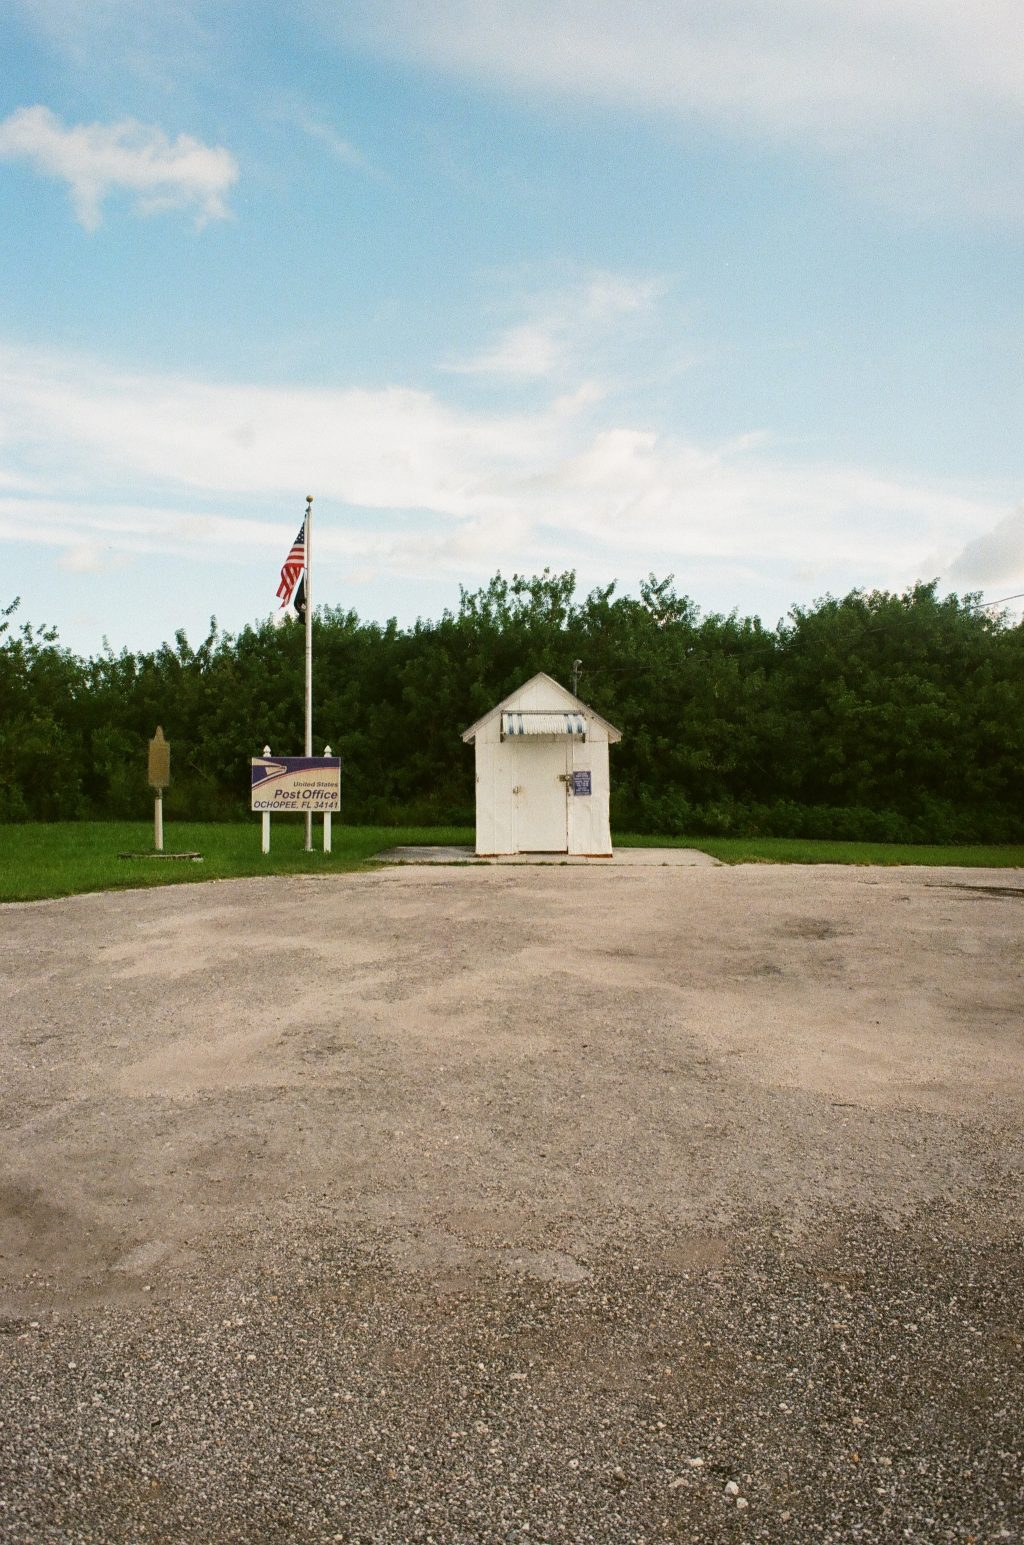 The smallest Post Office in the US located in Ochopee, FL - Kodak Ultramax 400 + Minolta XD-11 (a.k.a XD-7)